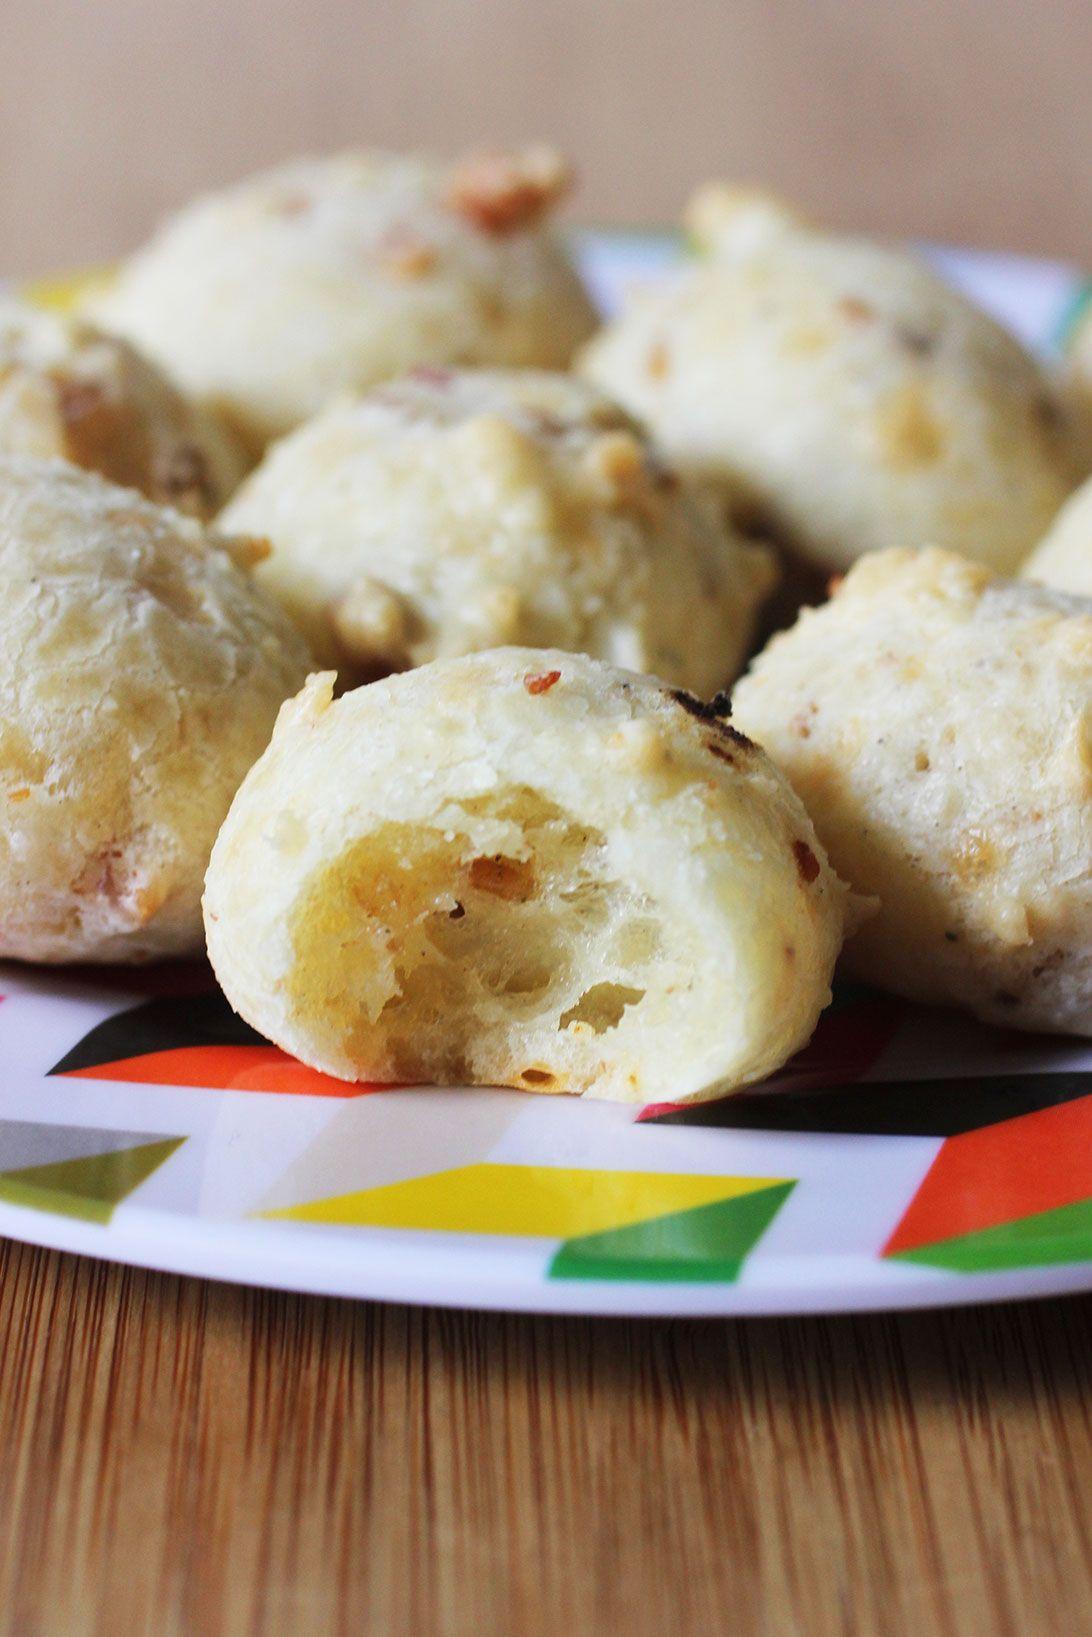 Brazilian Cheese Bread (Pão de Queijo Food, Food and